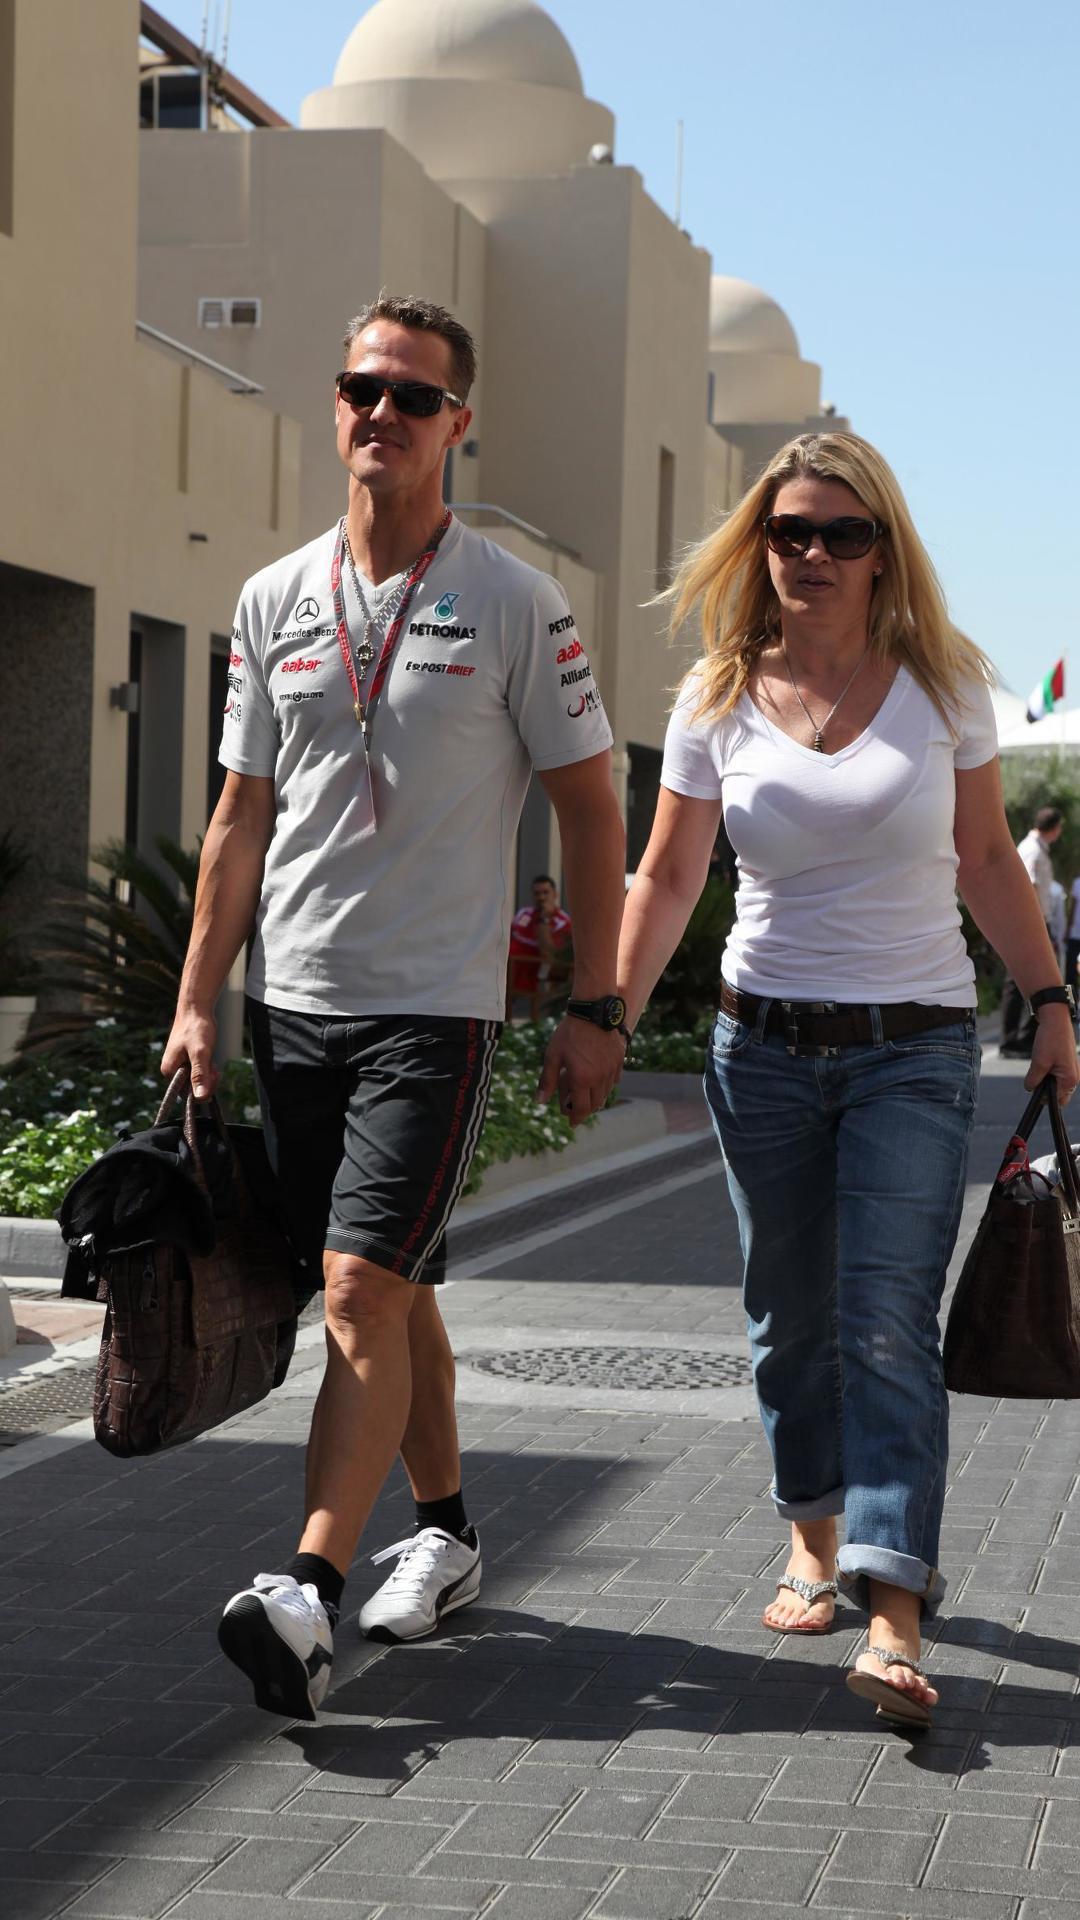 Schumacher family stops publication of hospital photos